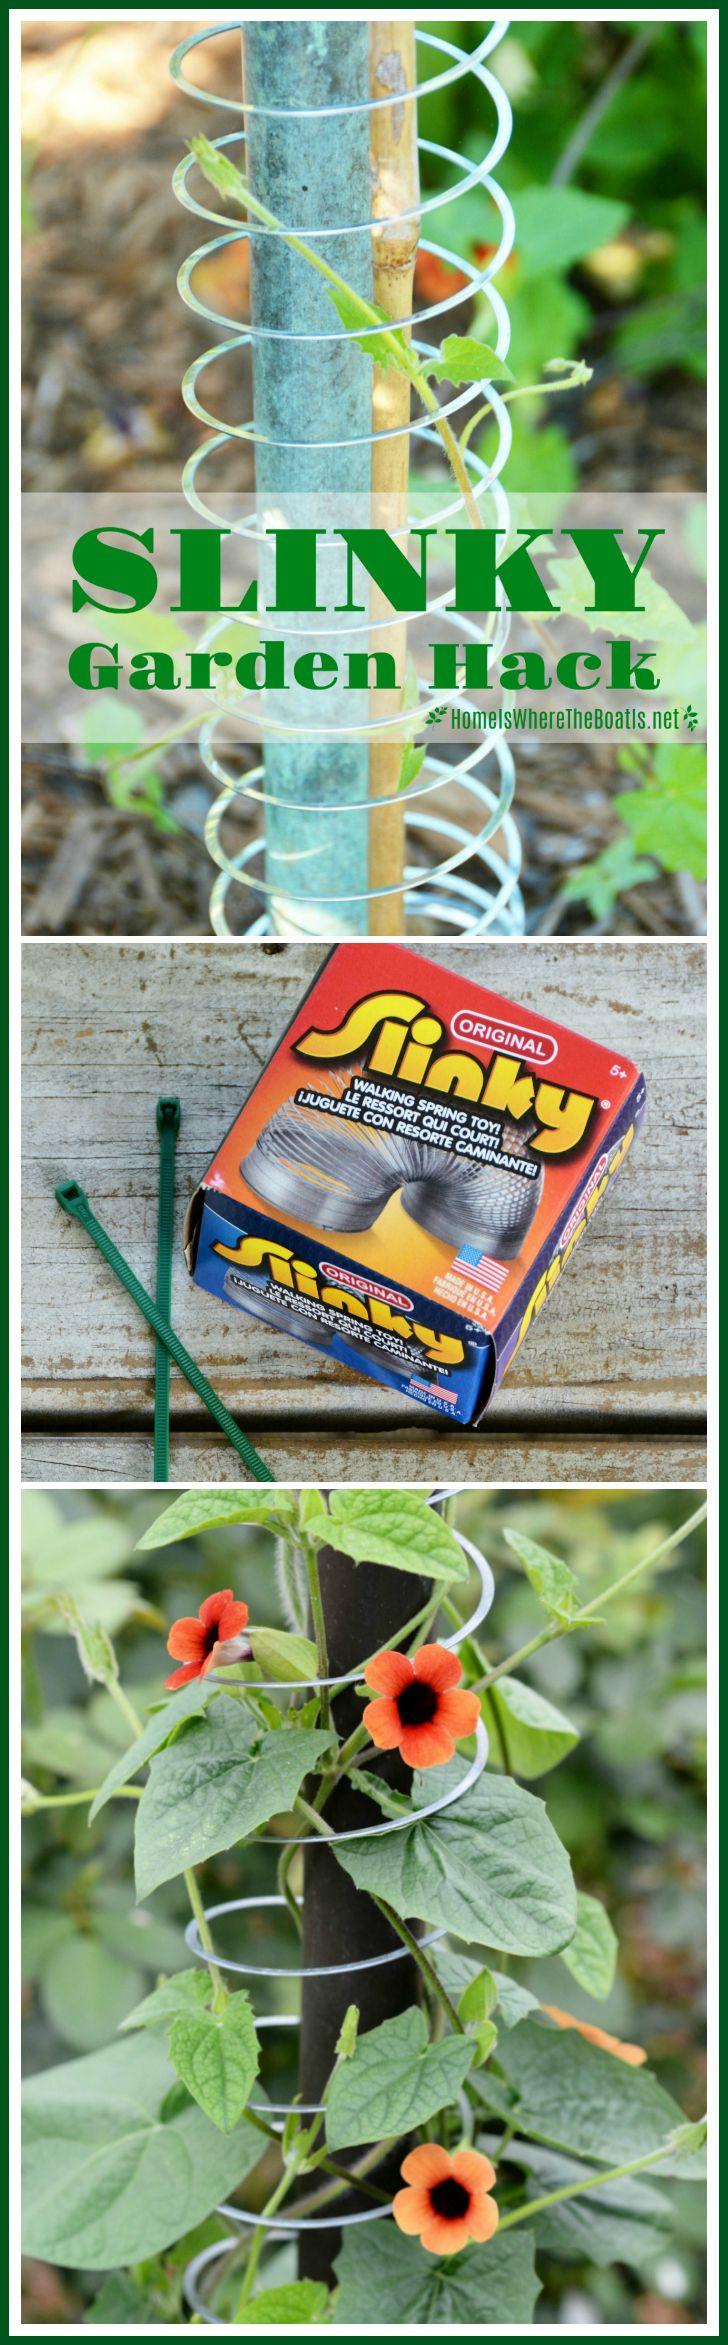 Slinky Hack and Trellis for a Favorite Flowering Vine ,  Jenna Sivells